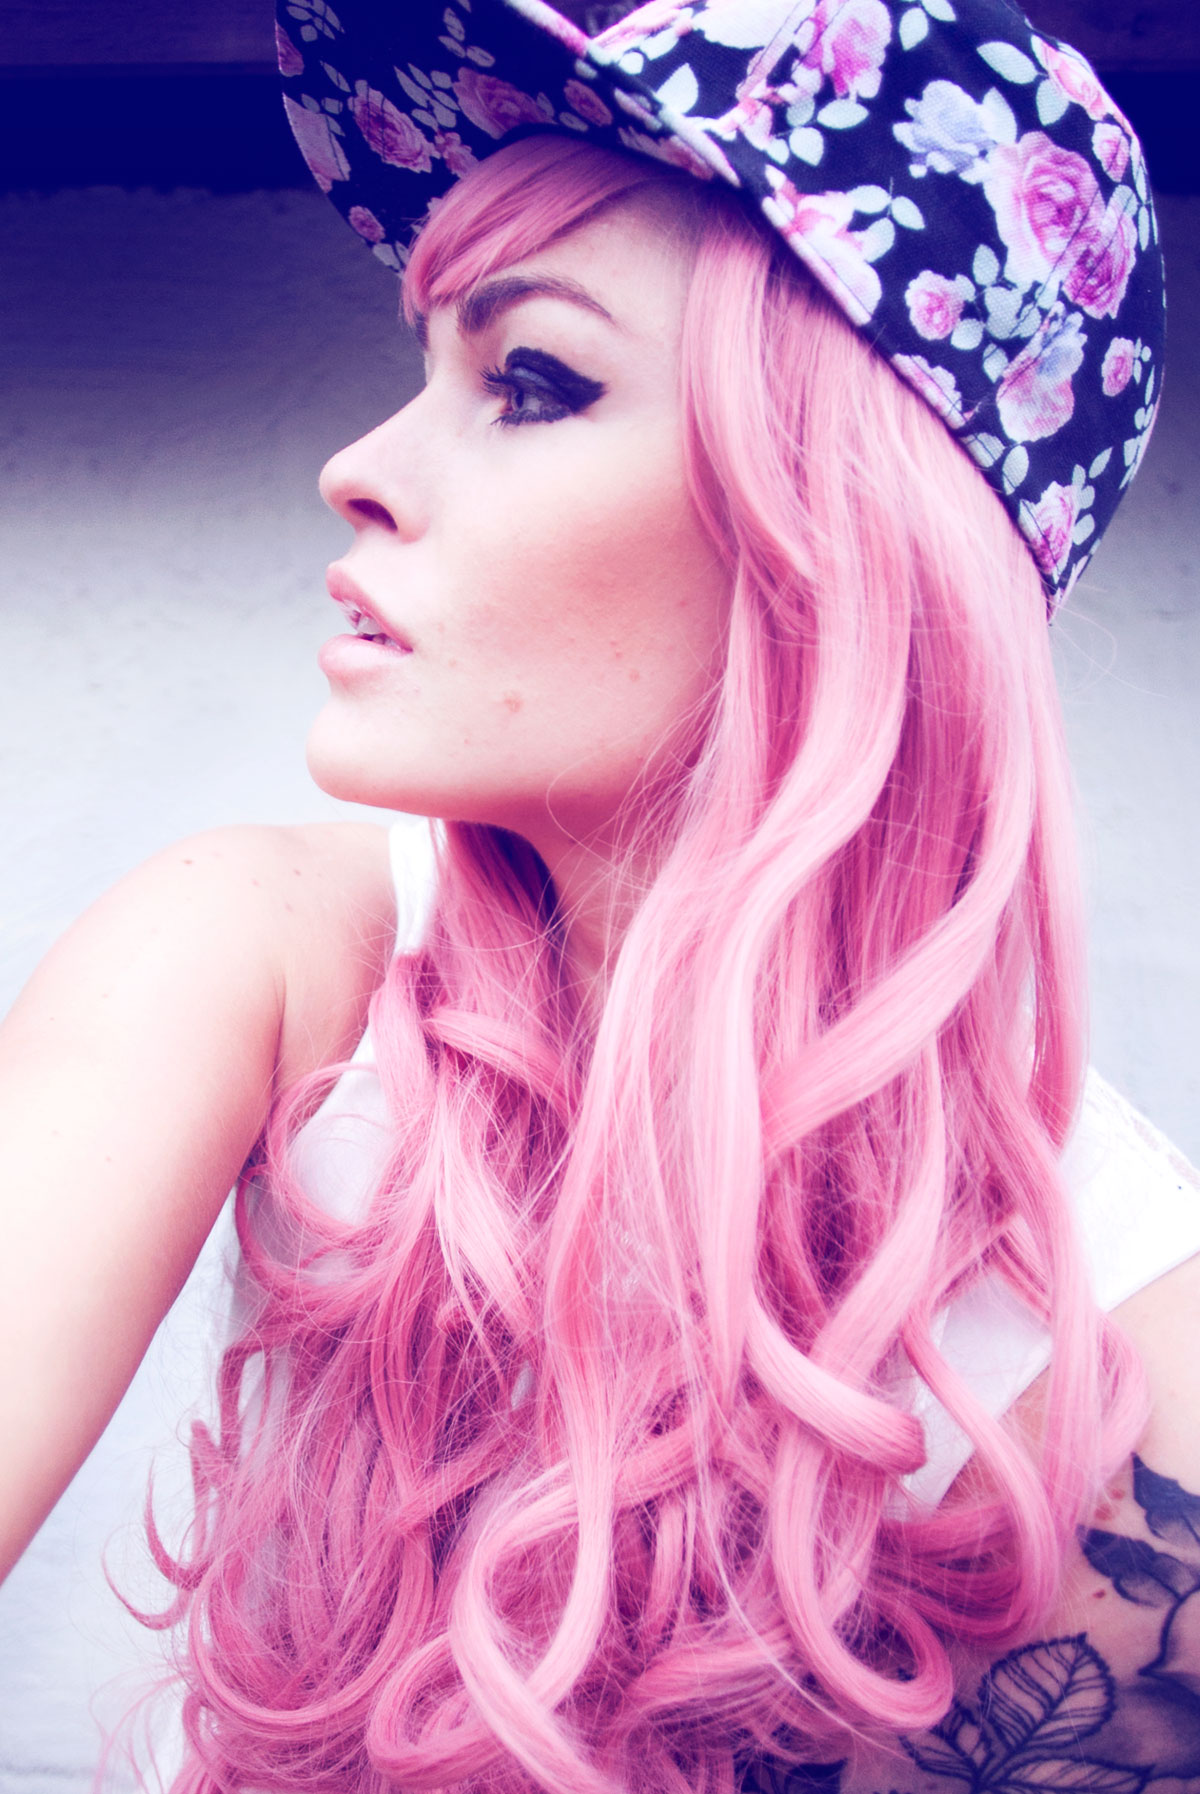 pinkfotoooo